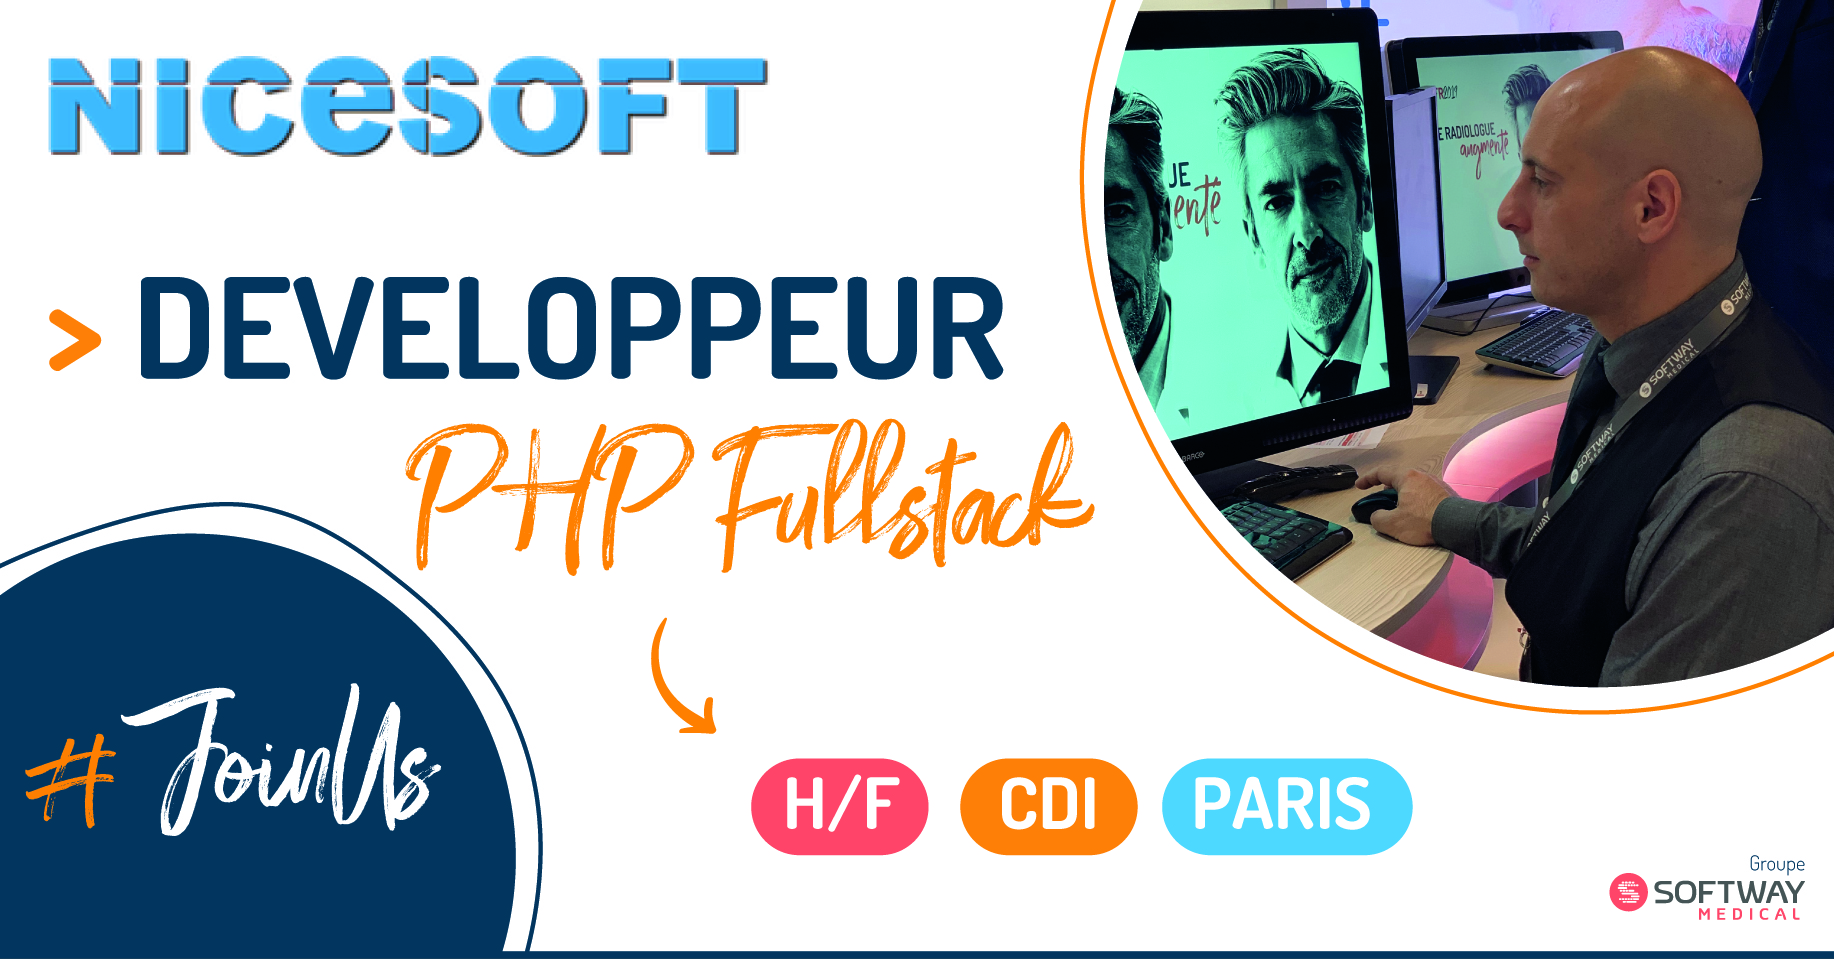 DEVELOPPEUR PHP FULLSTACK – H/F – Paris